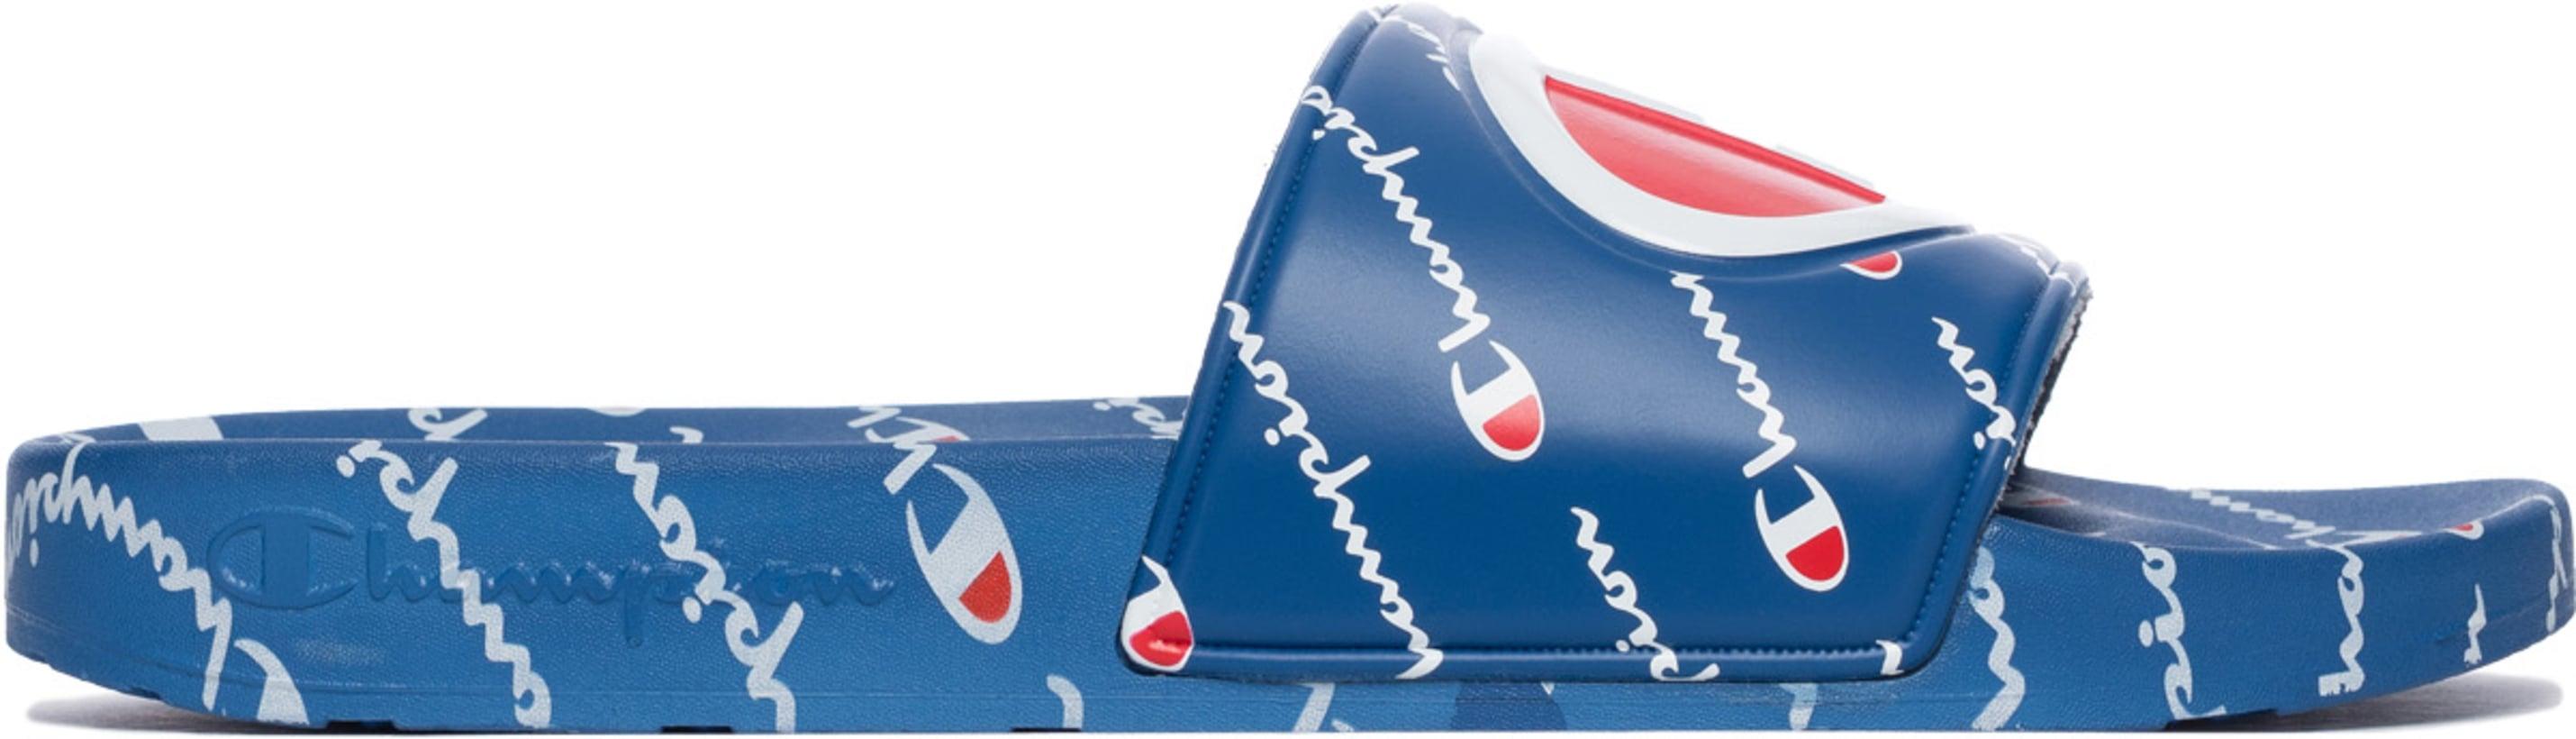 75ff120b05a Champion  IPO Repeat Slide - Royal Blue